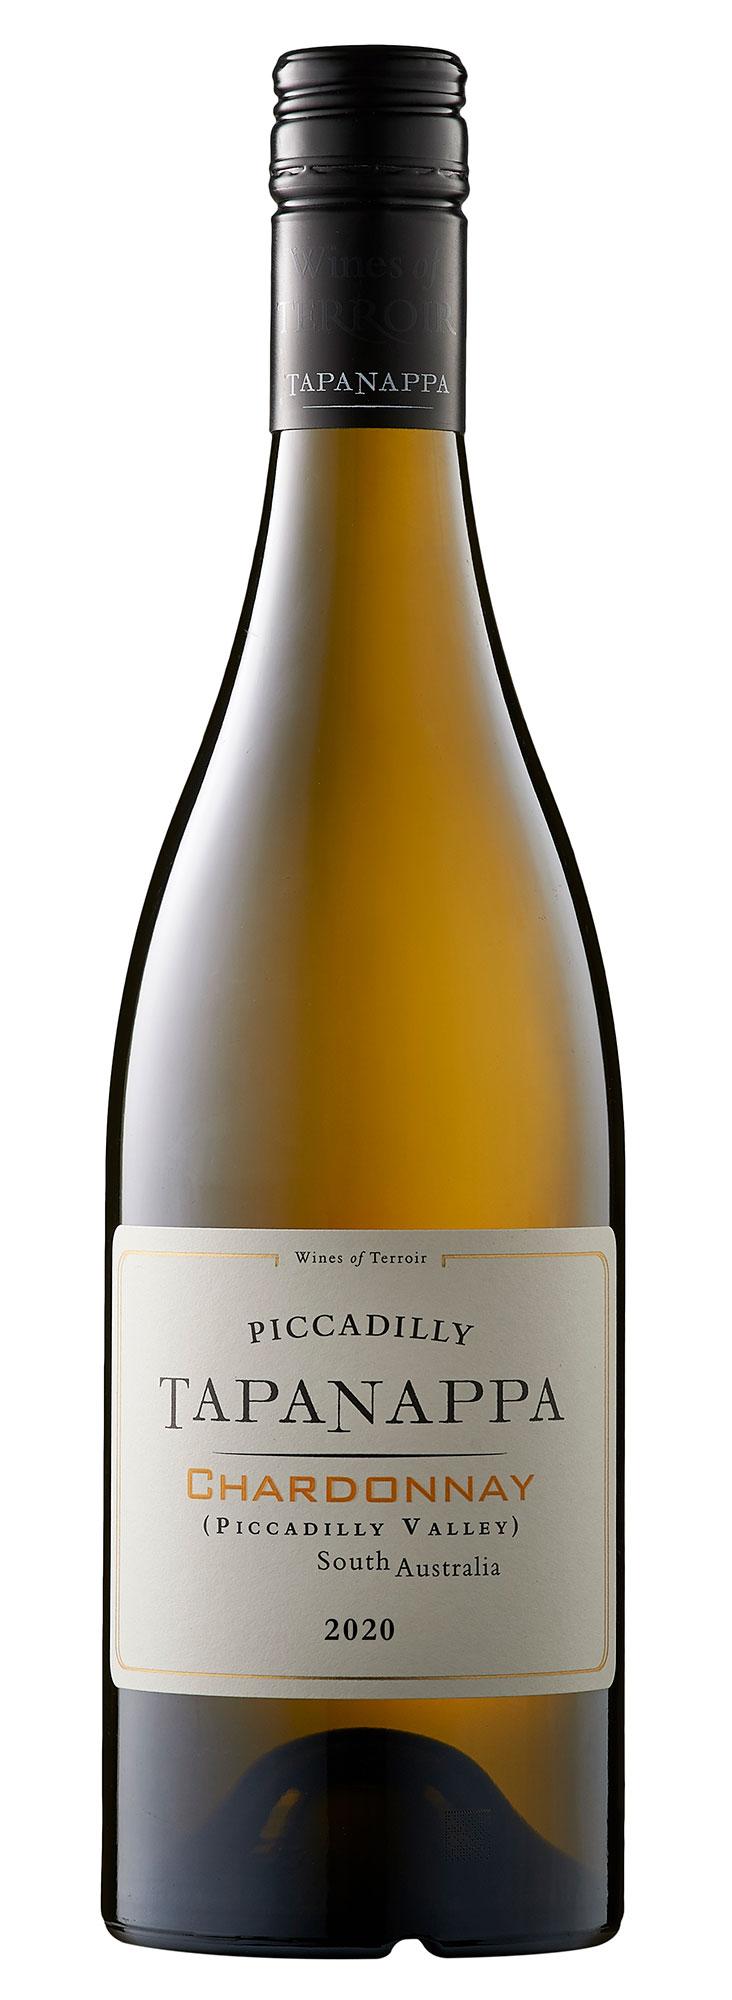 Tapanappa Piccadilly Valley 2020 Chardonnay